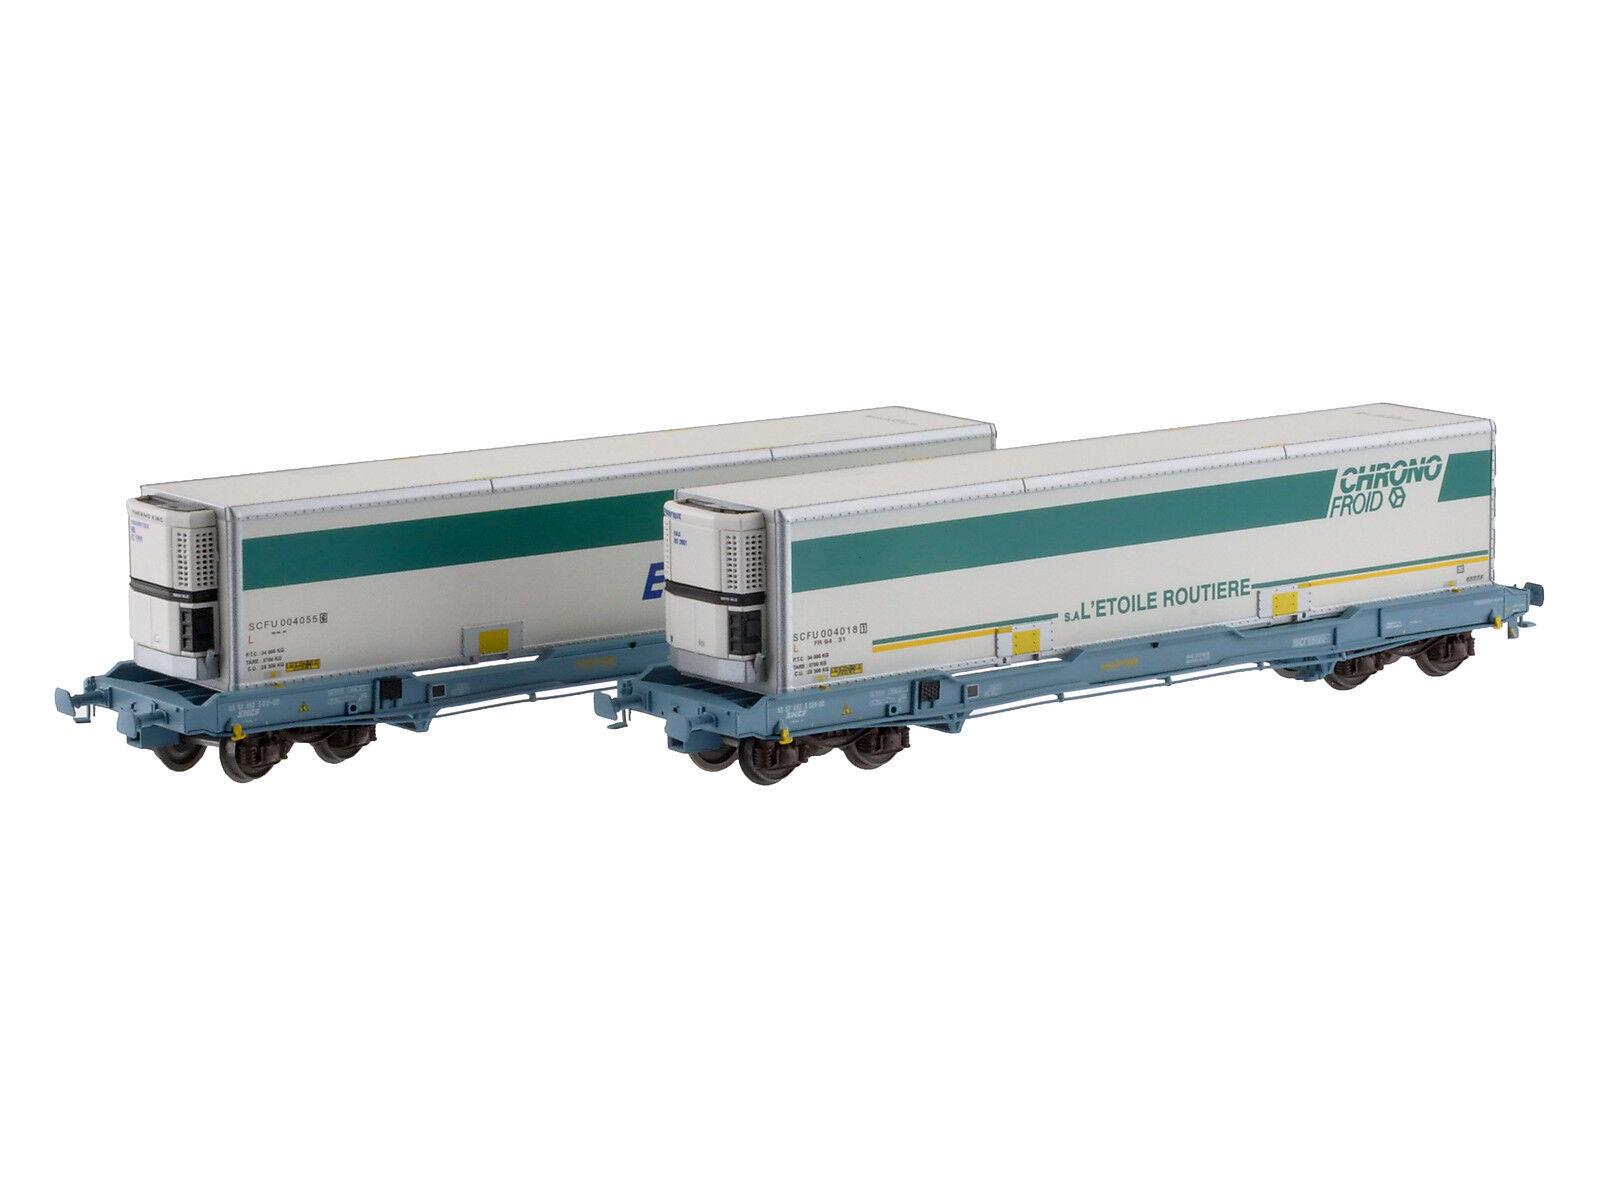 LS Models 30306 SNCF 2x 4 ACH containertragwag KC Nova Trans 40' chronofroid ep5